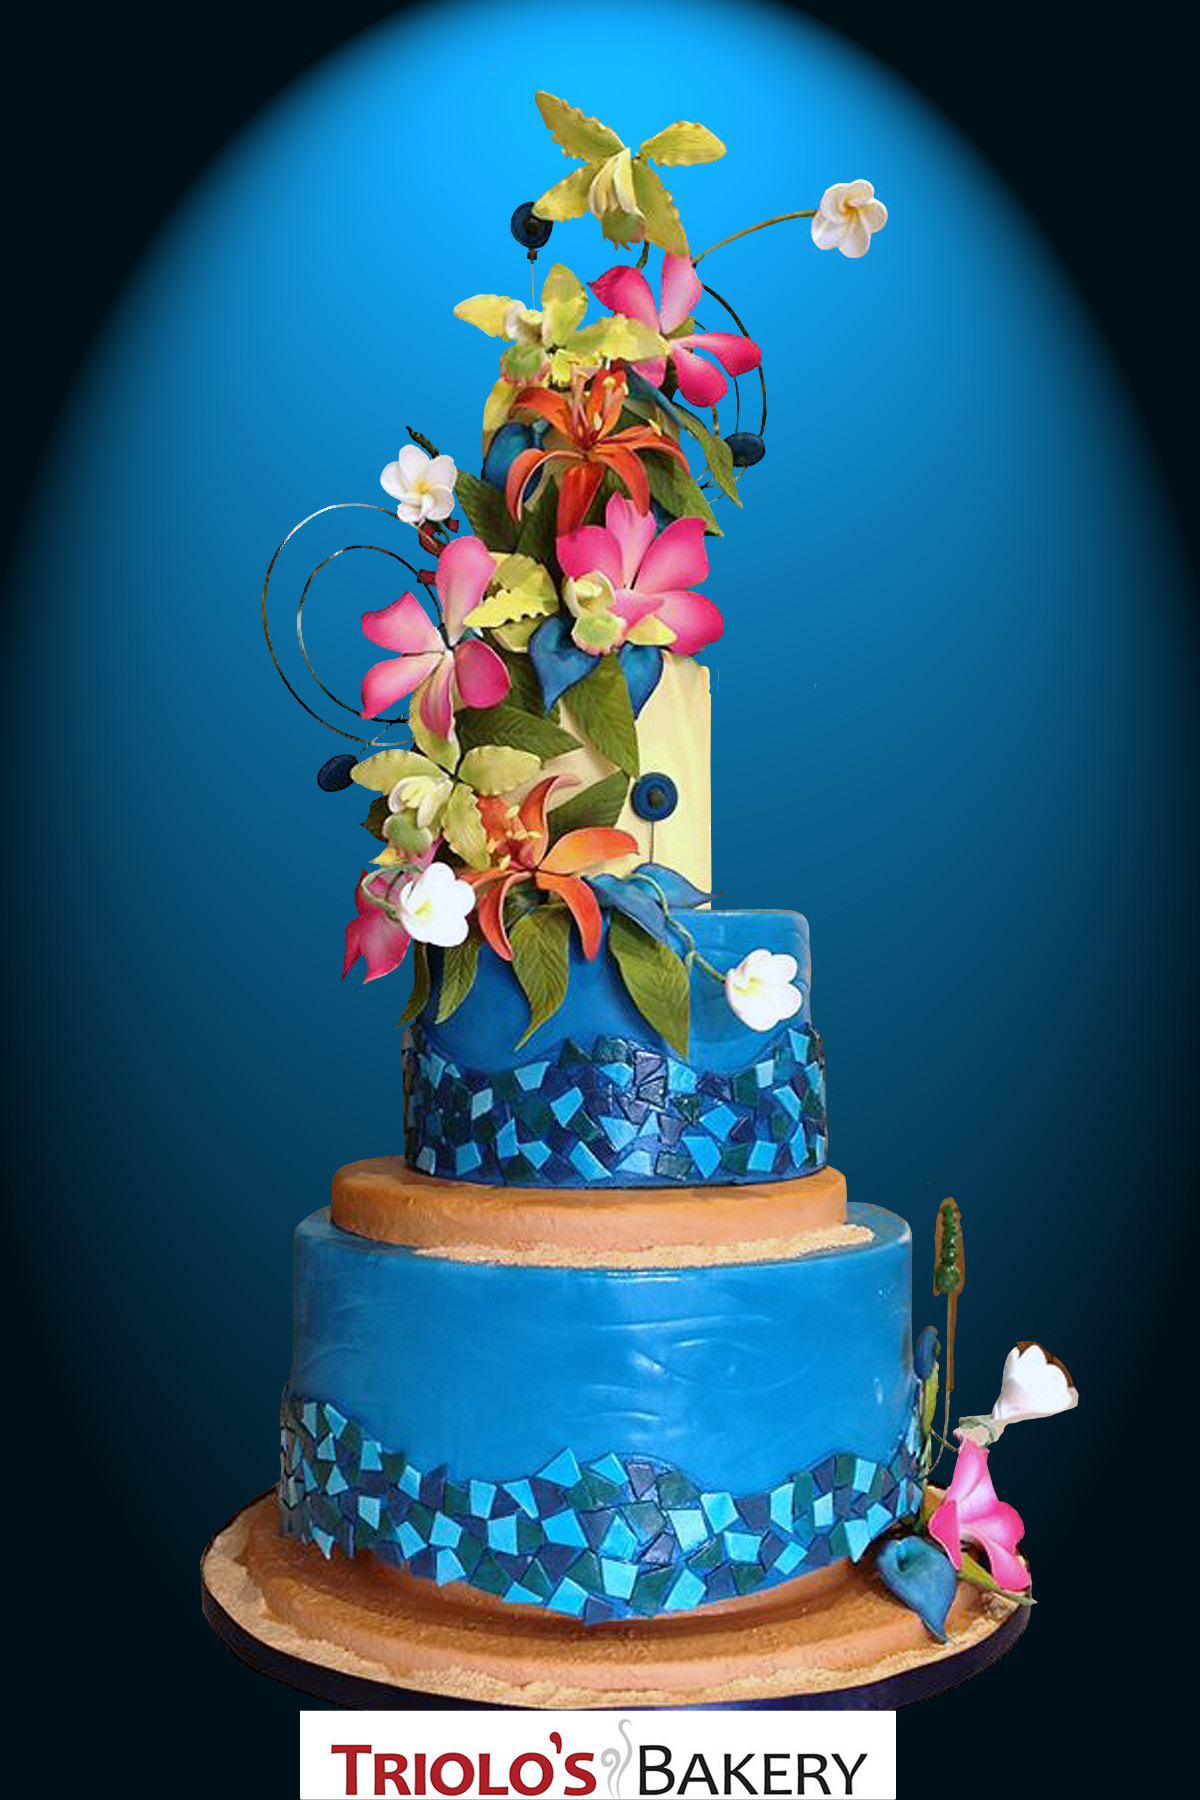 Carribean Wedding Cakes  Caribbean Wedding Cake Triolo s Bakery